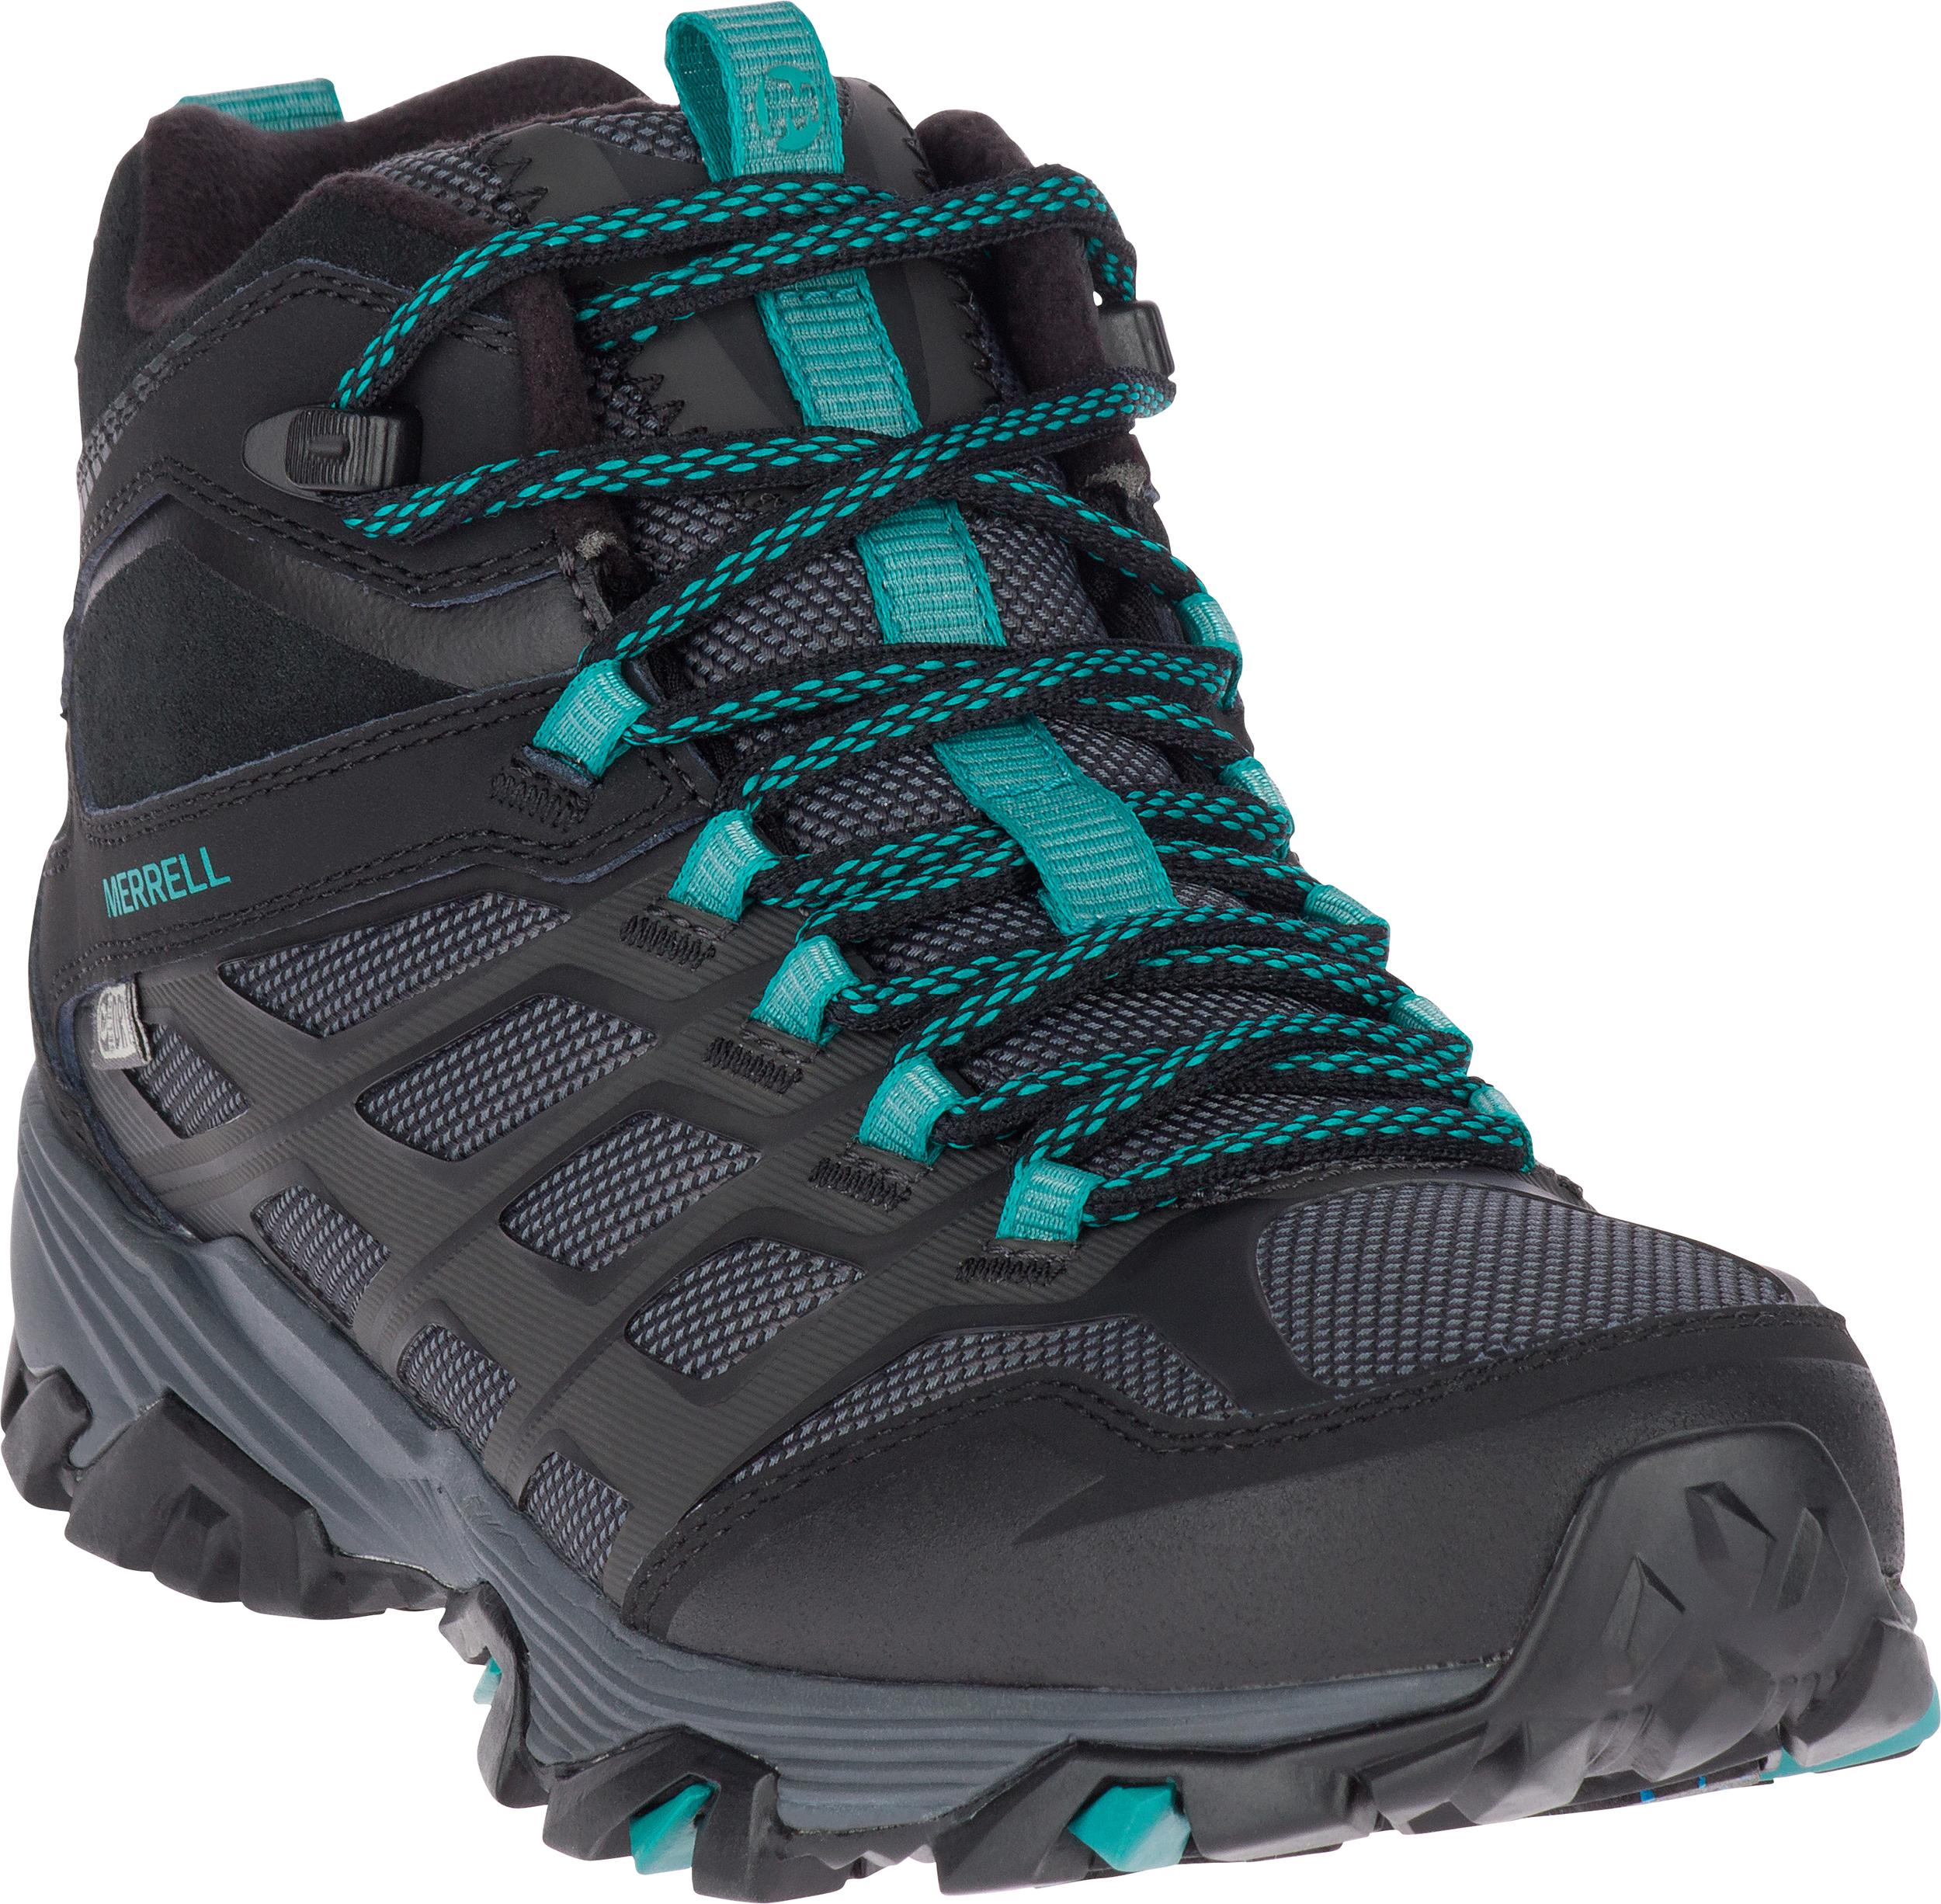 04792dc3e69 Merrell Moab FST Ice+ Winter Boots - Women's